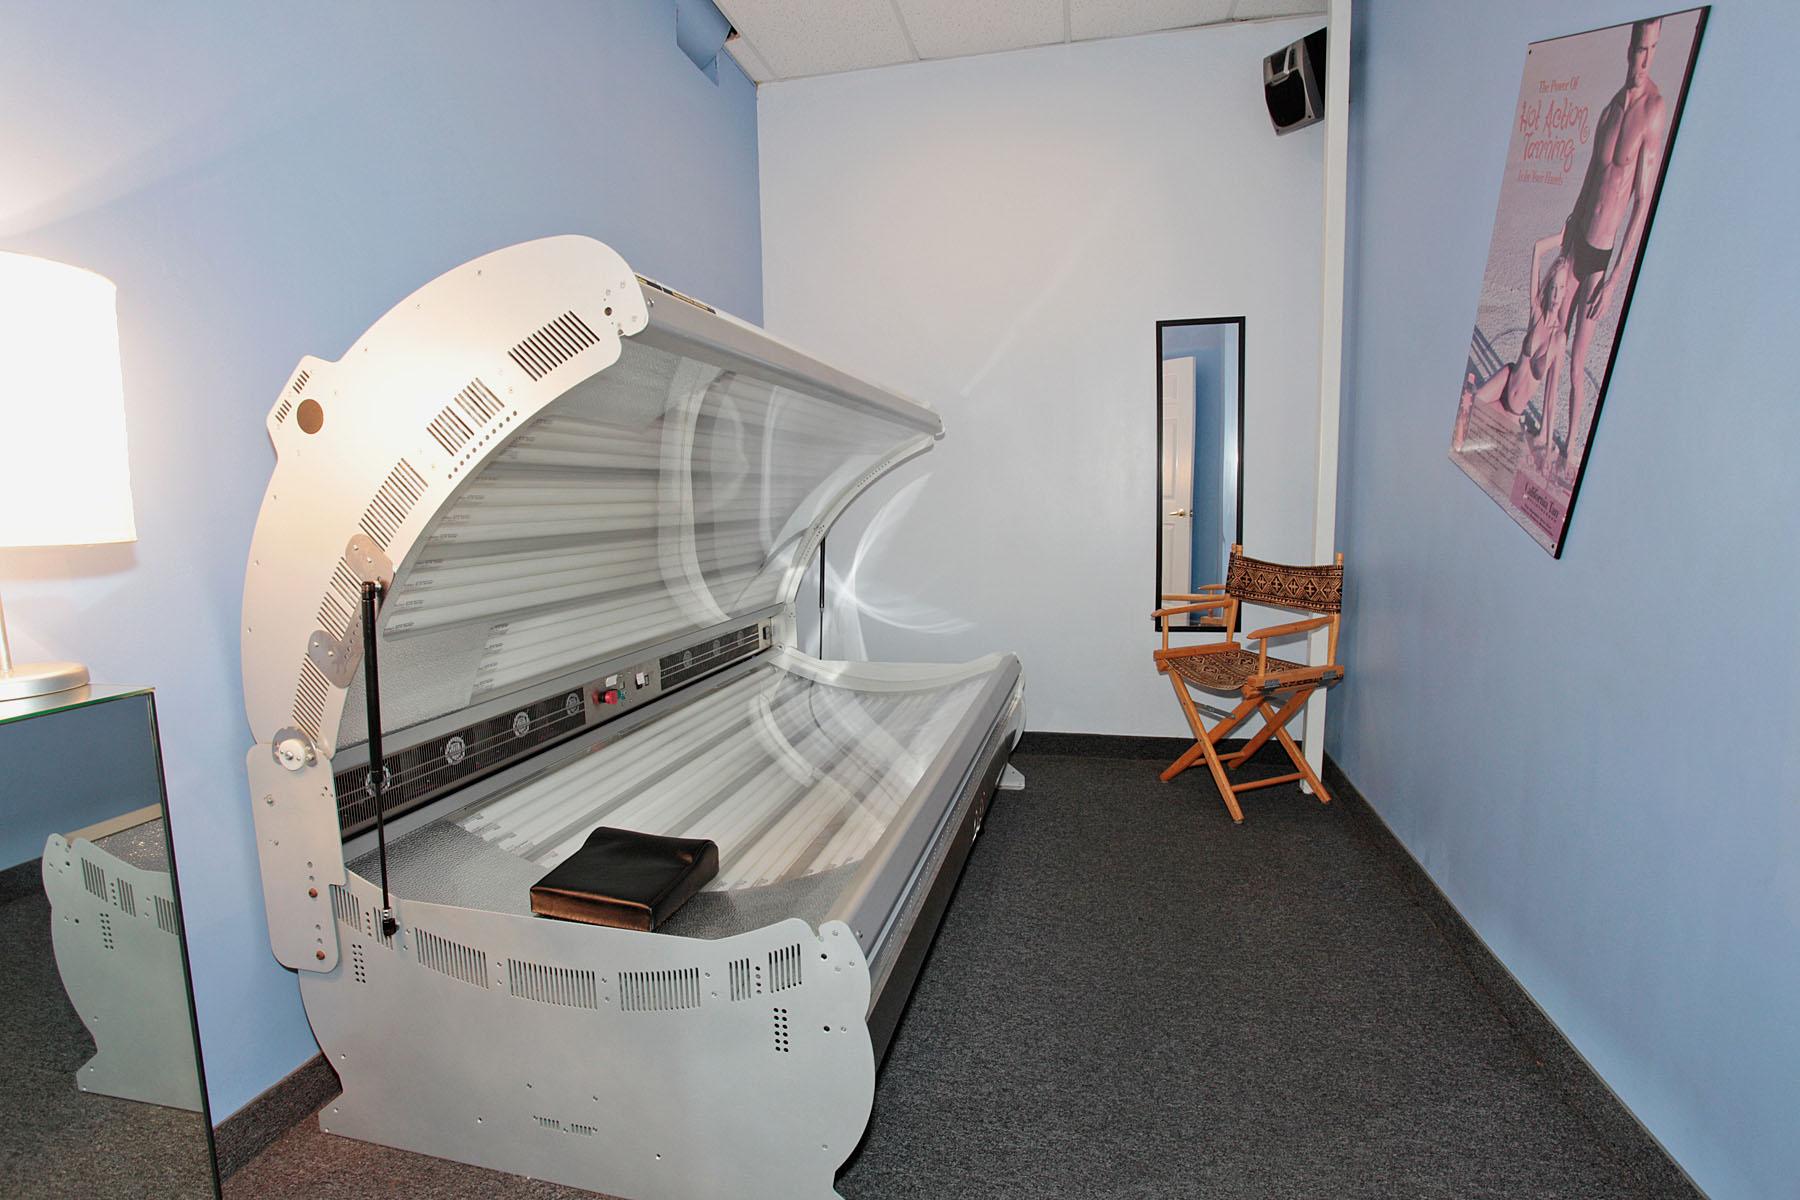 98 degrees tanning salon official virtual tour seevirtual for 360 degrees salon